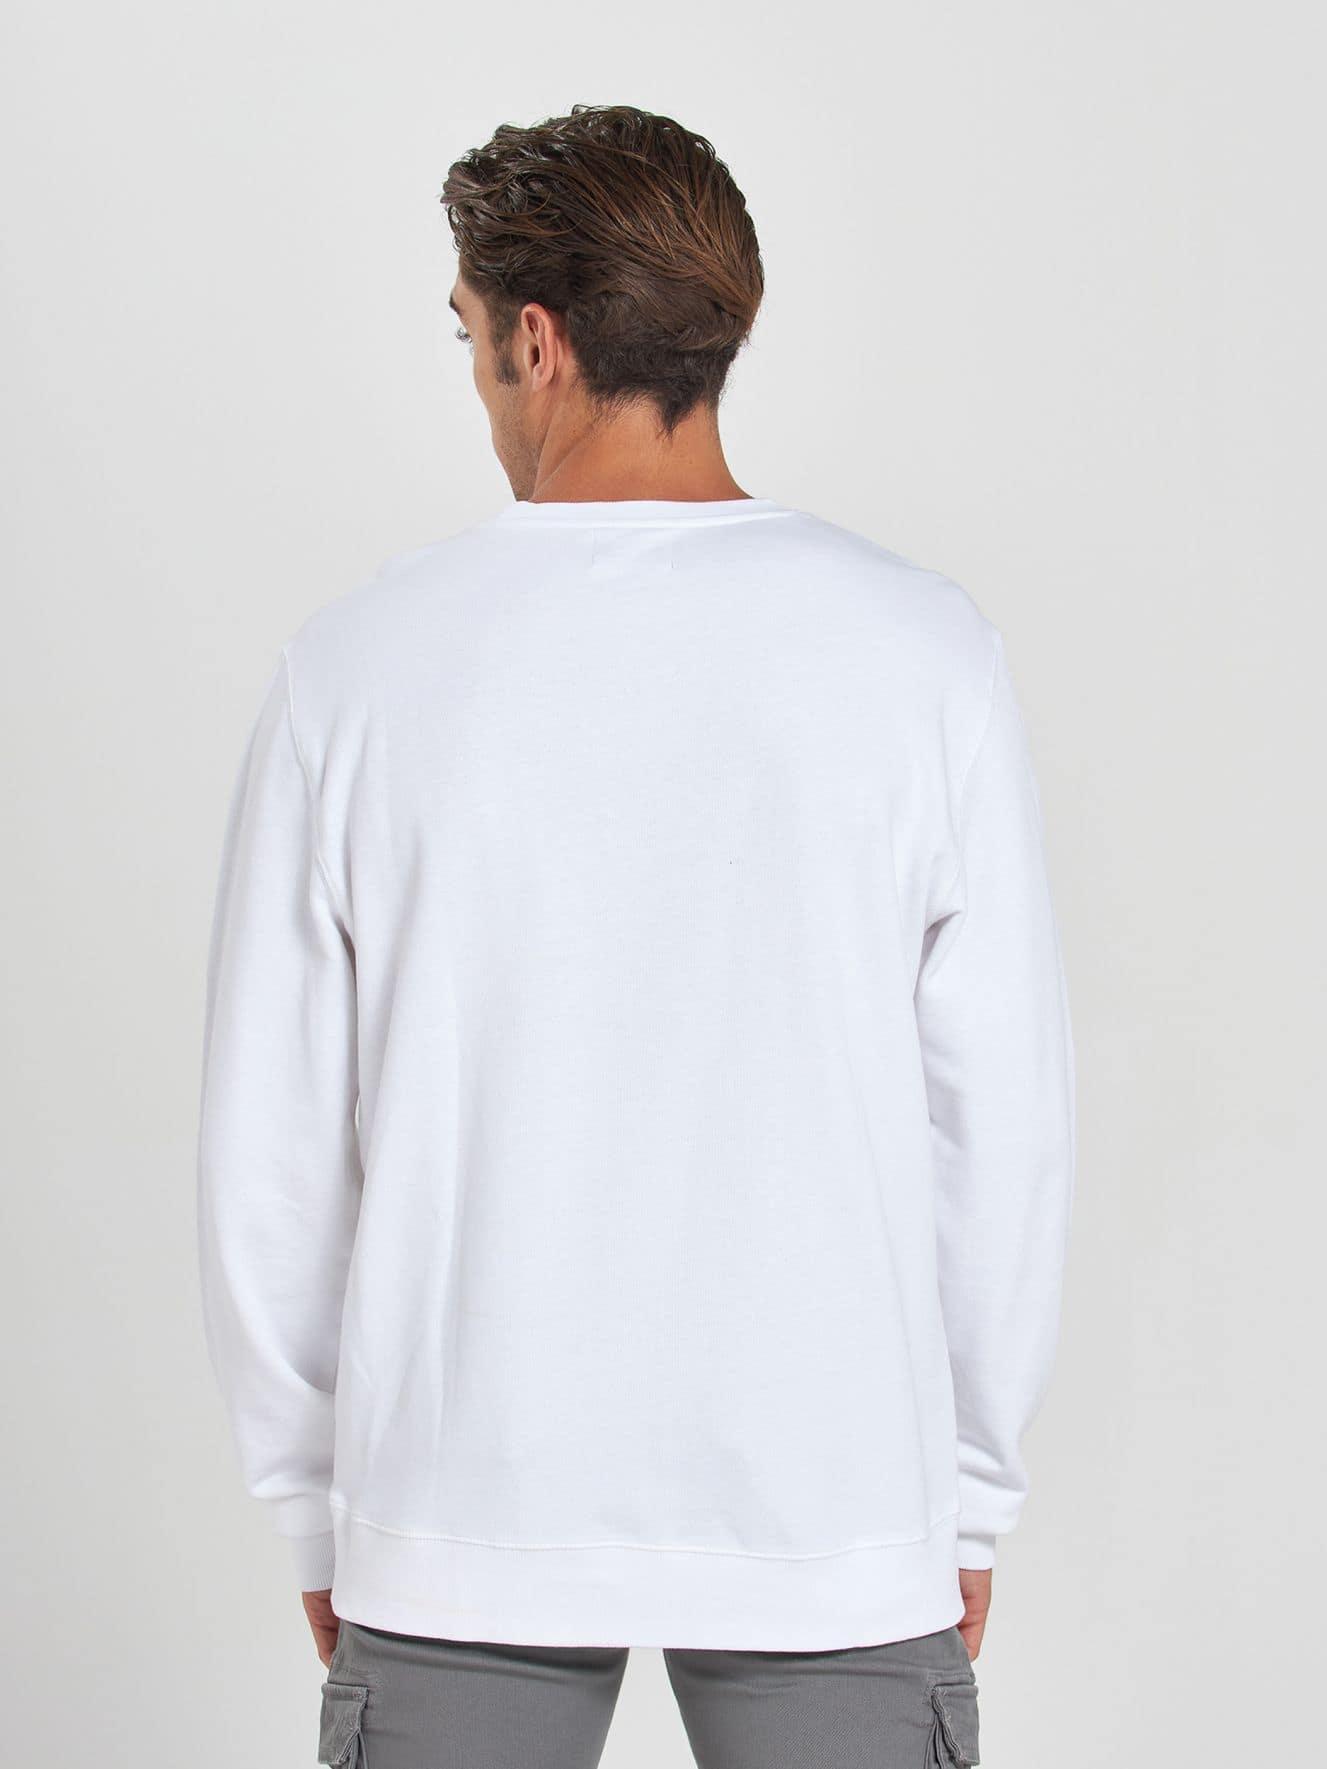 Sweat shirt Homme Terranova